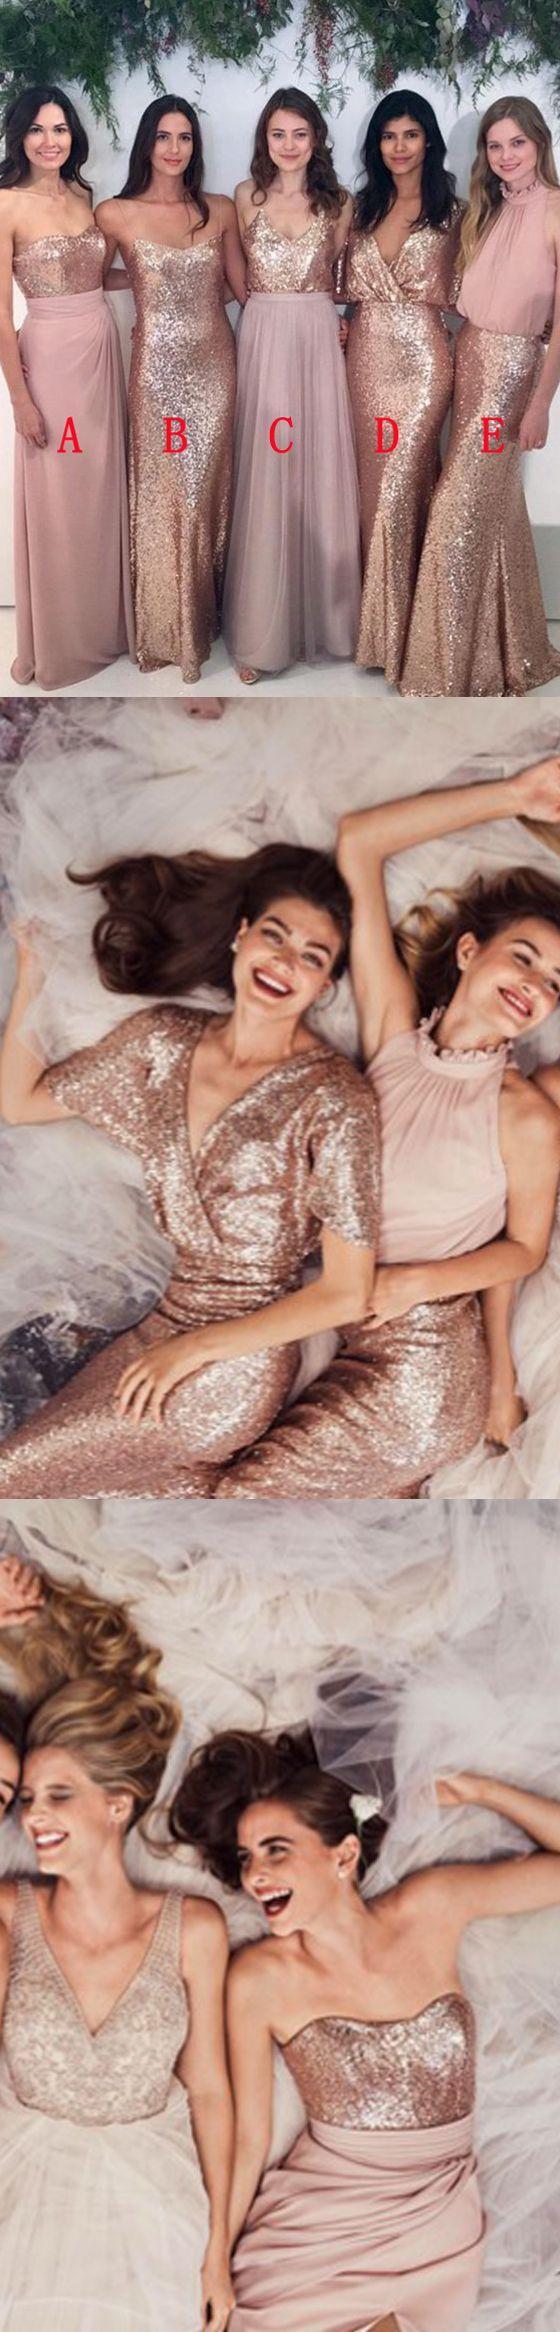 Affordable Mismatched Sequin Charming Long Bridesmaid Dresses, BG51563